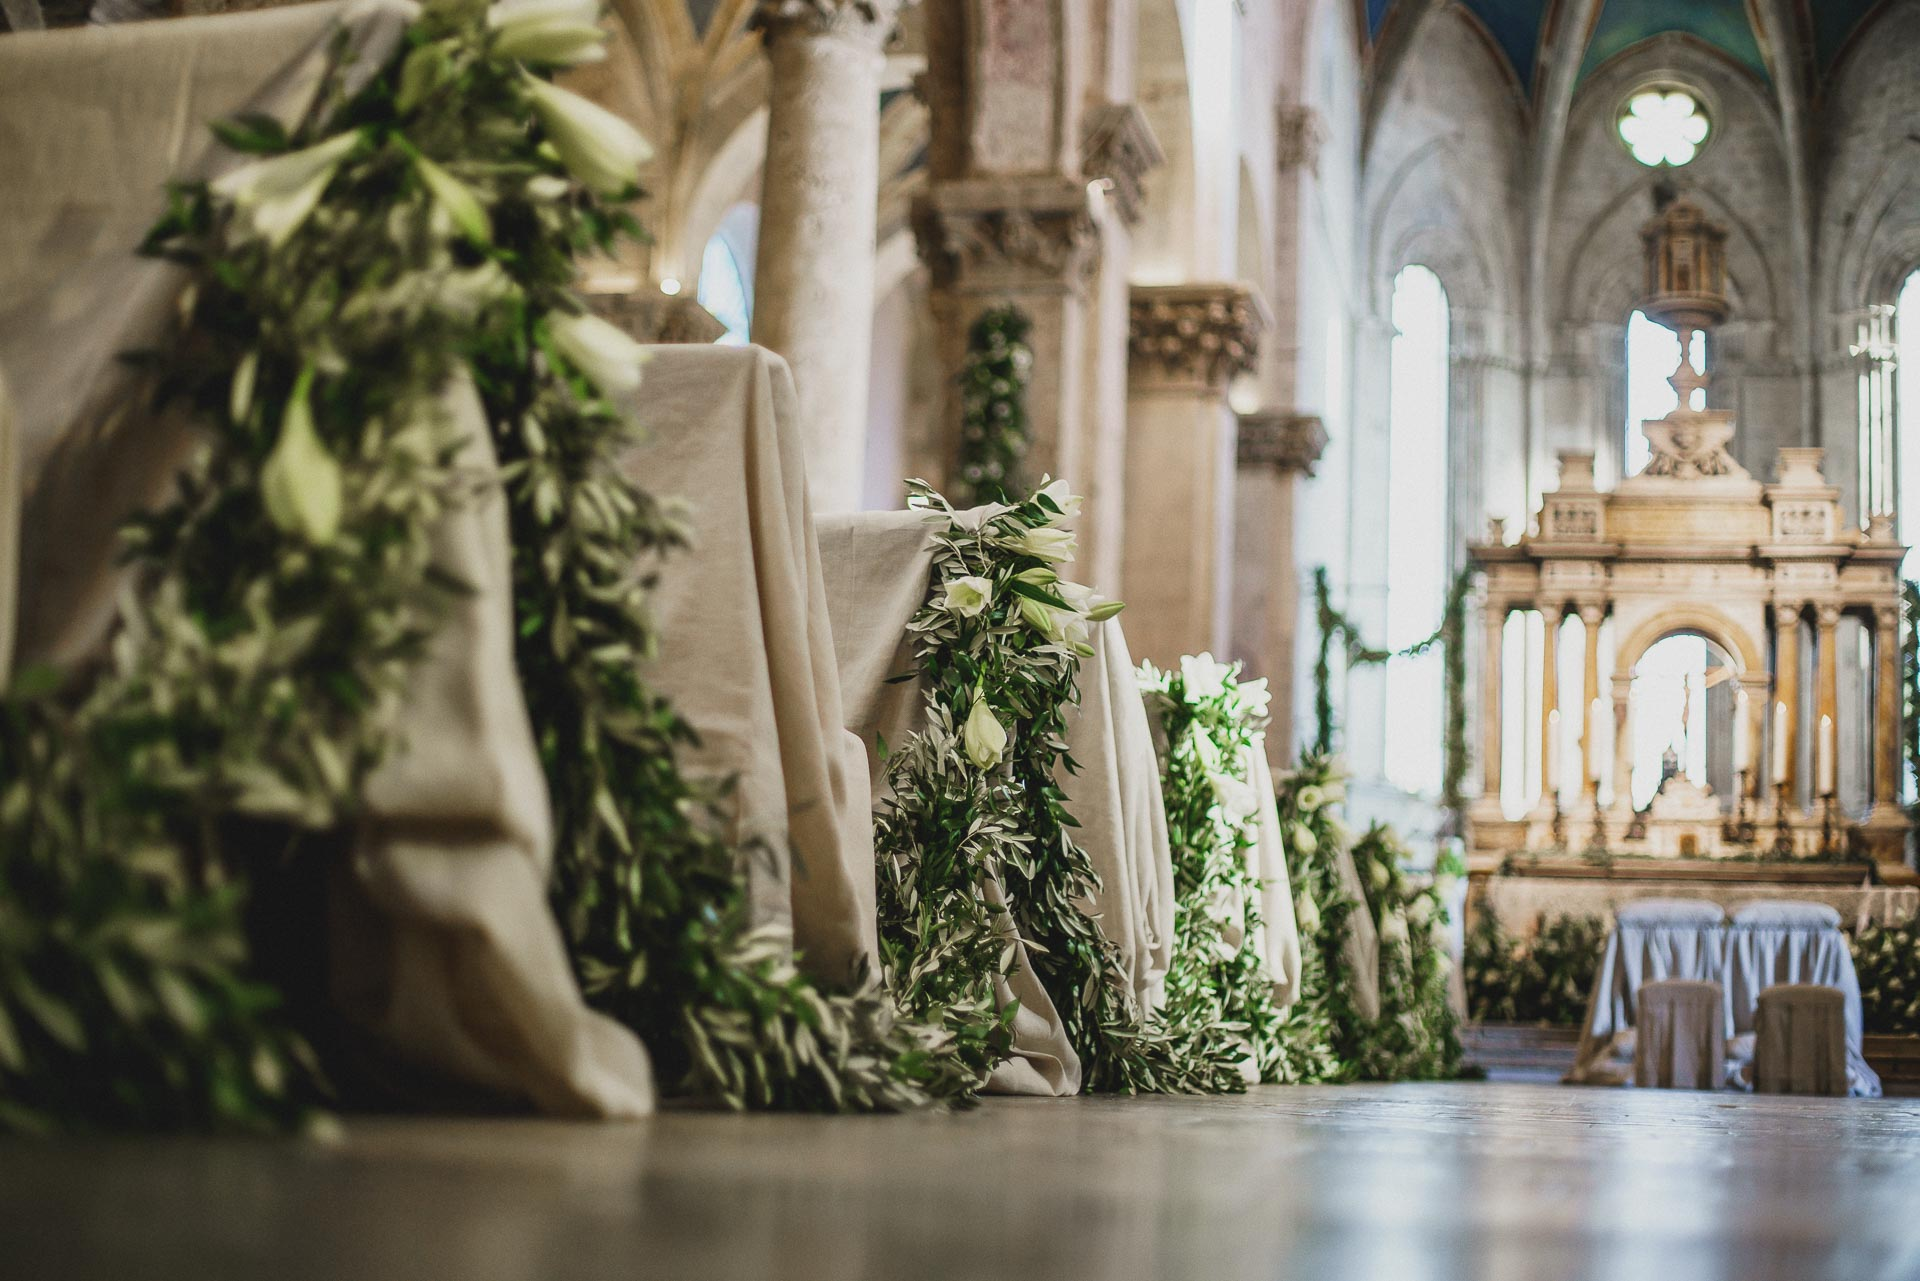 sebastian-flowers-weddings-photo-stefano-casati